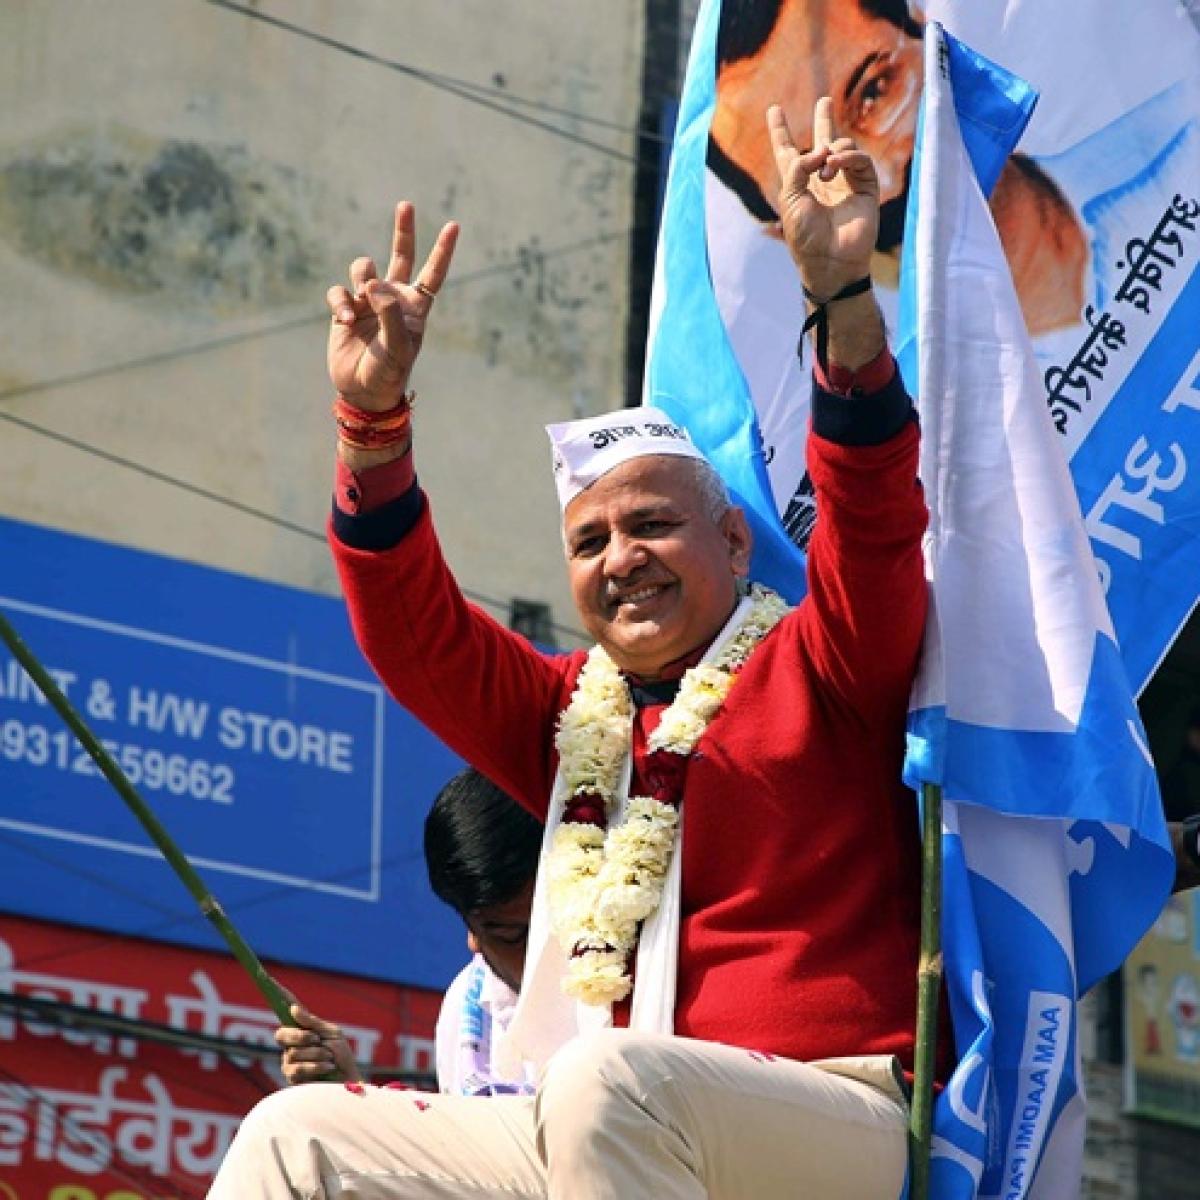 Delhi Election Results 2020: Deputy CM Manish Sisodia trails by 1,579 votes, faces stiff battle against BJP's Ravinder Negi